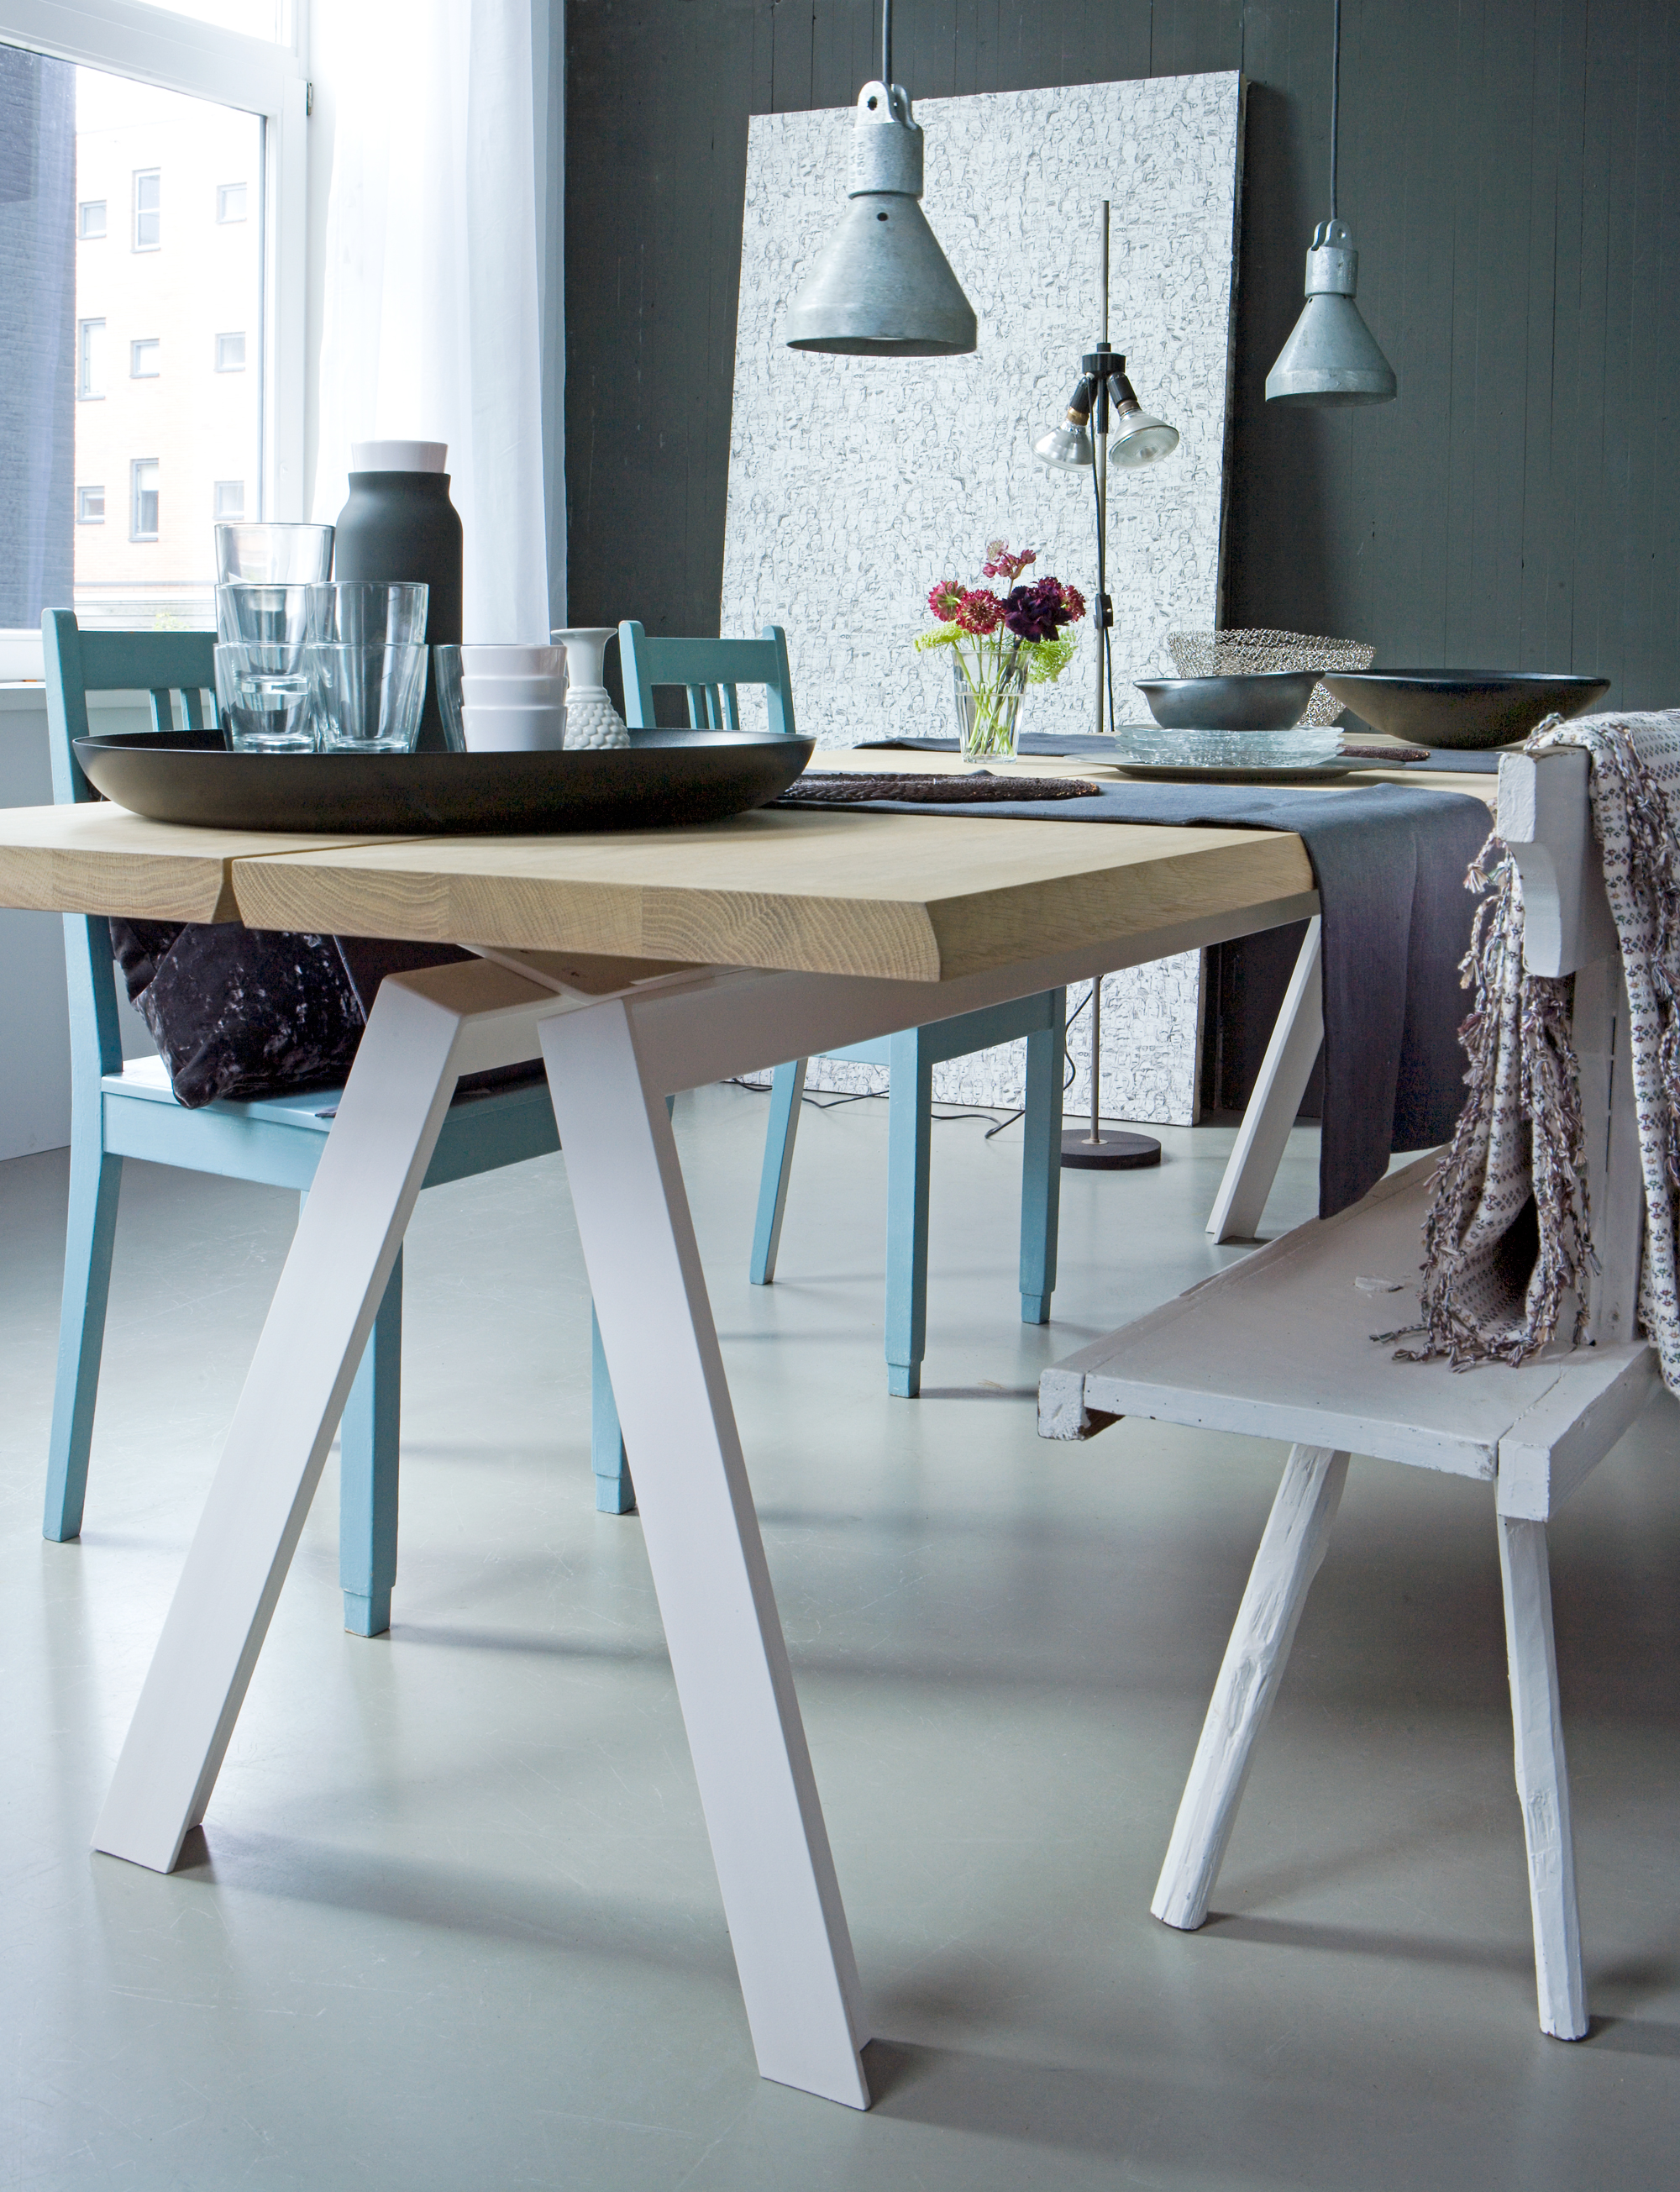 Ikea Tafelblad Met Schragen.Schragen Tafel Metalen En Houten Schragen Vtwonen